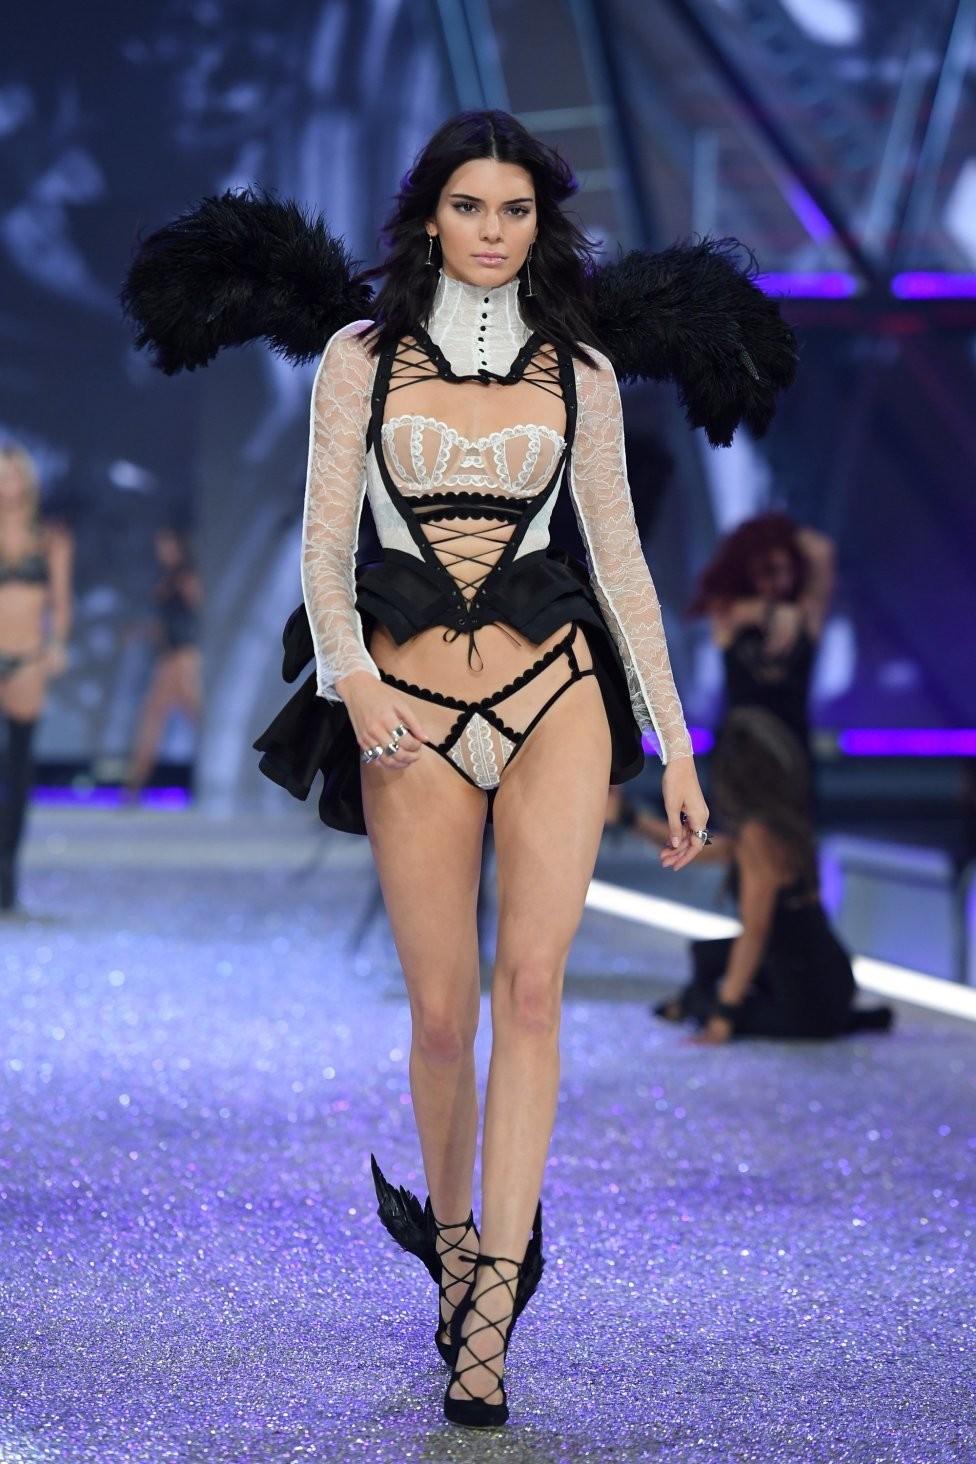 los ángeles de Victoria's Secret en Paris